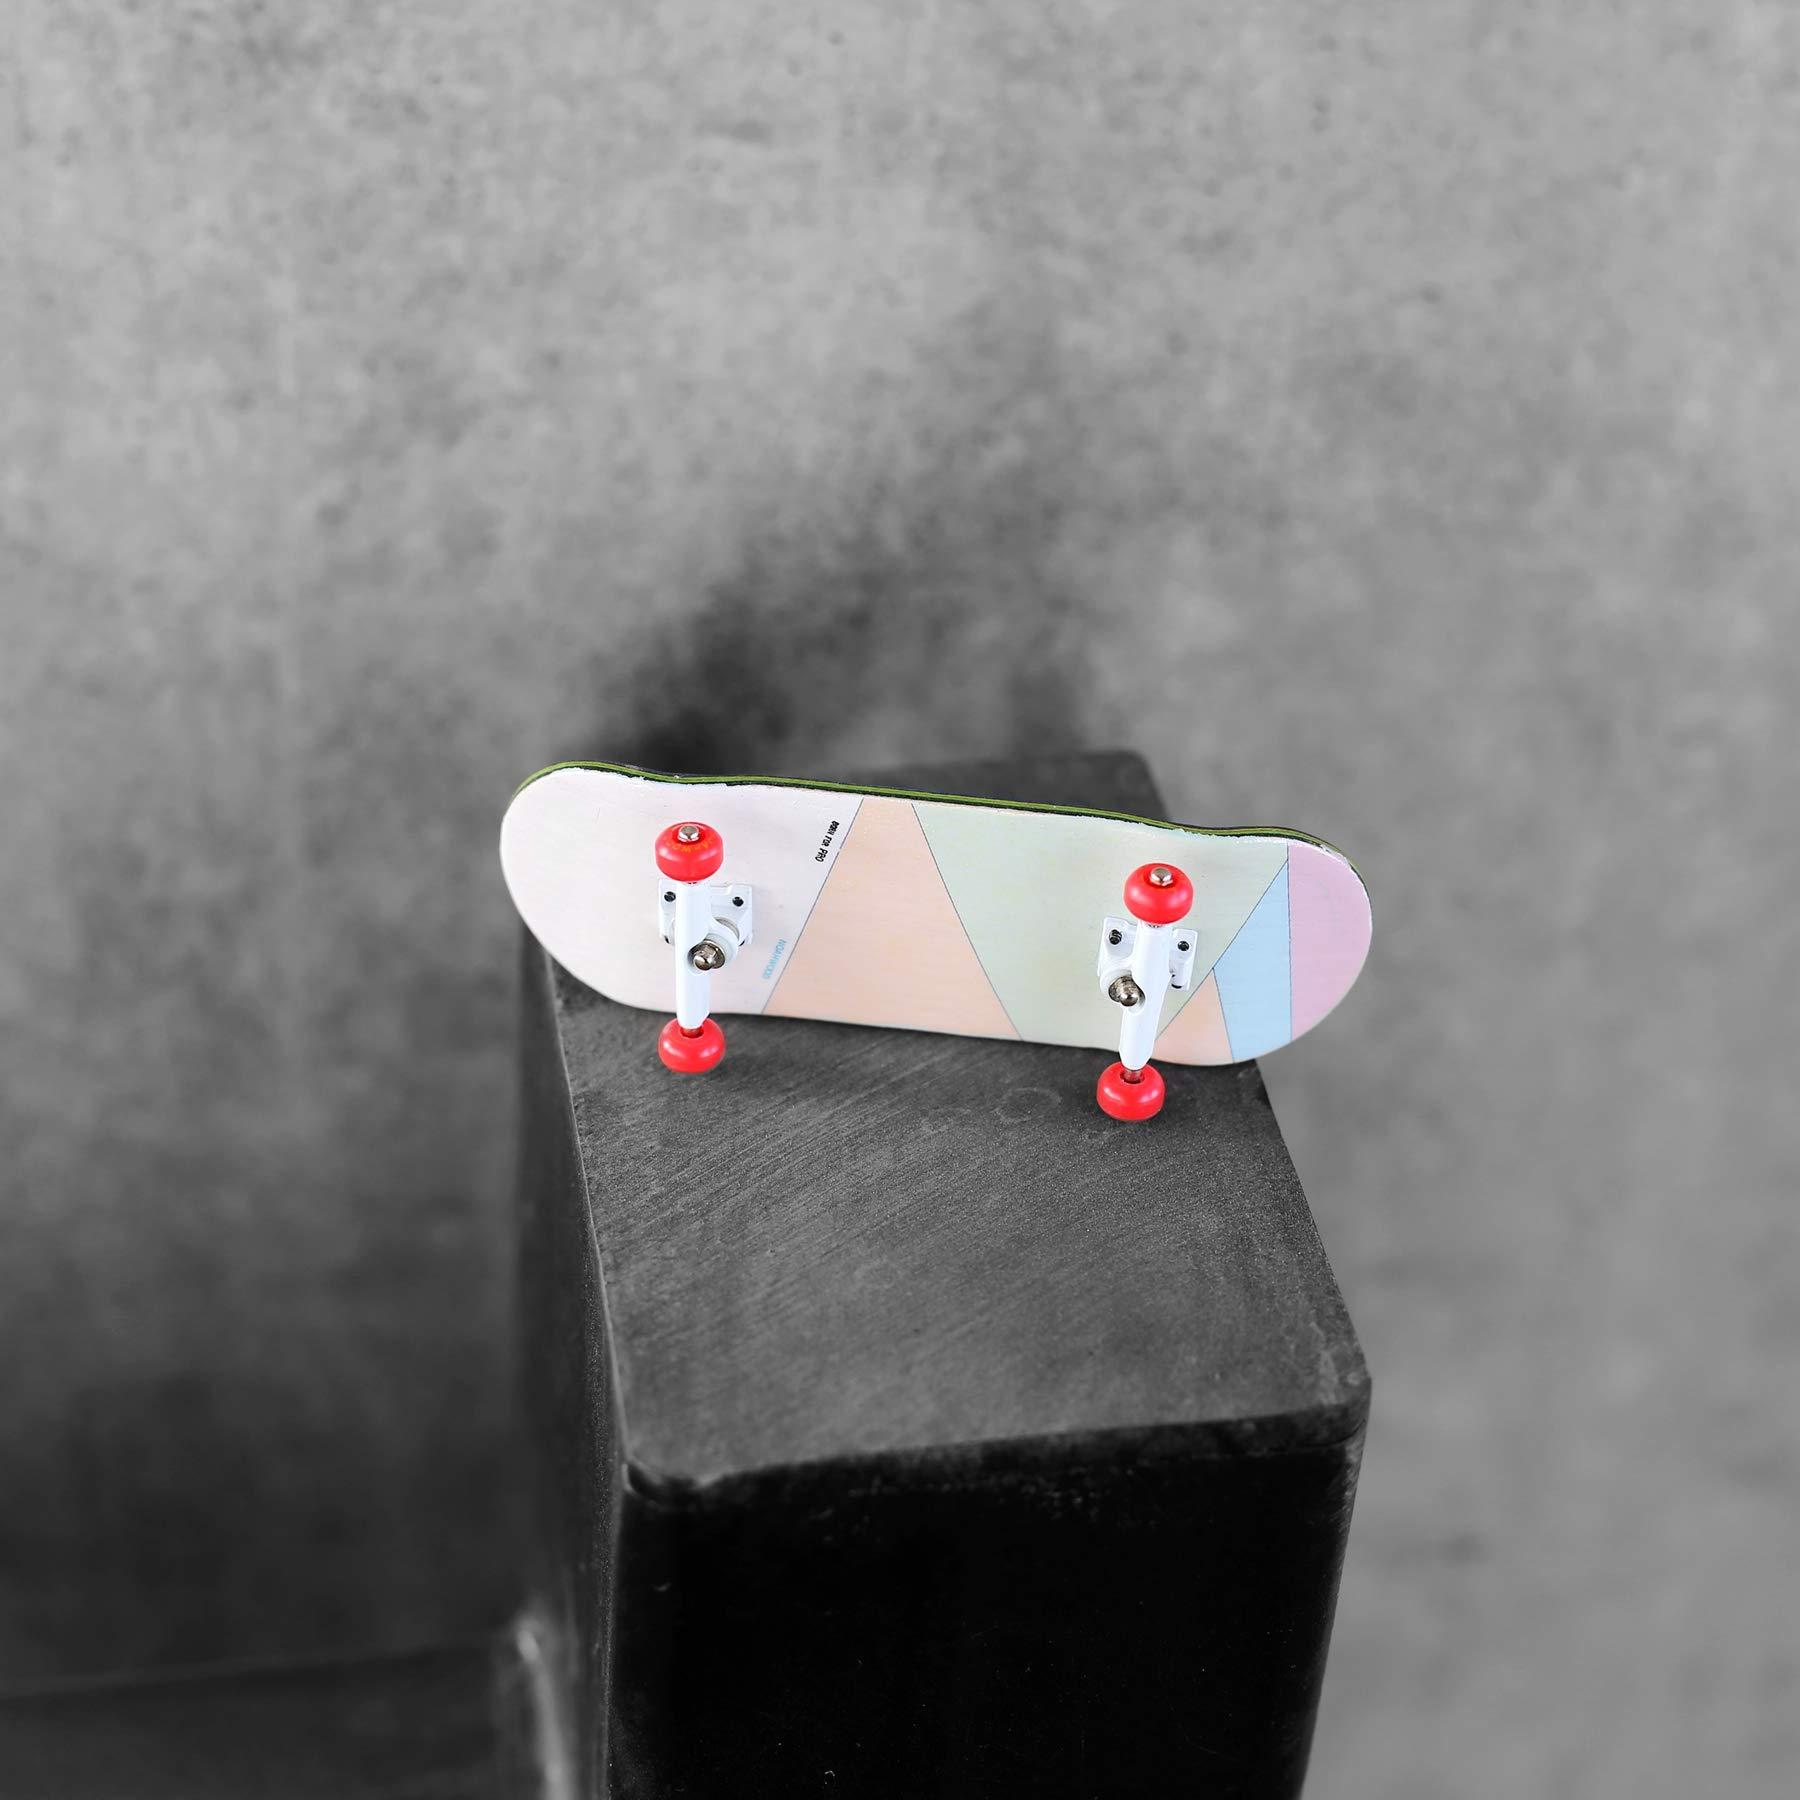 NOAHWOOD Wooden PRO Fingerboards (Deck,Truck,Wheel / a Set) (Born for PRO) by NOAHWOOD (Image #2)